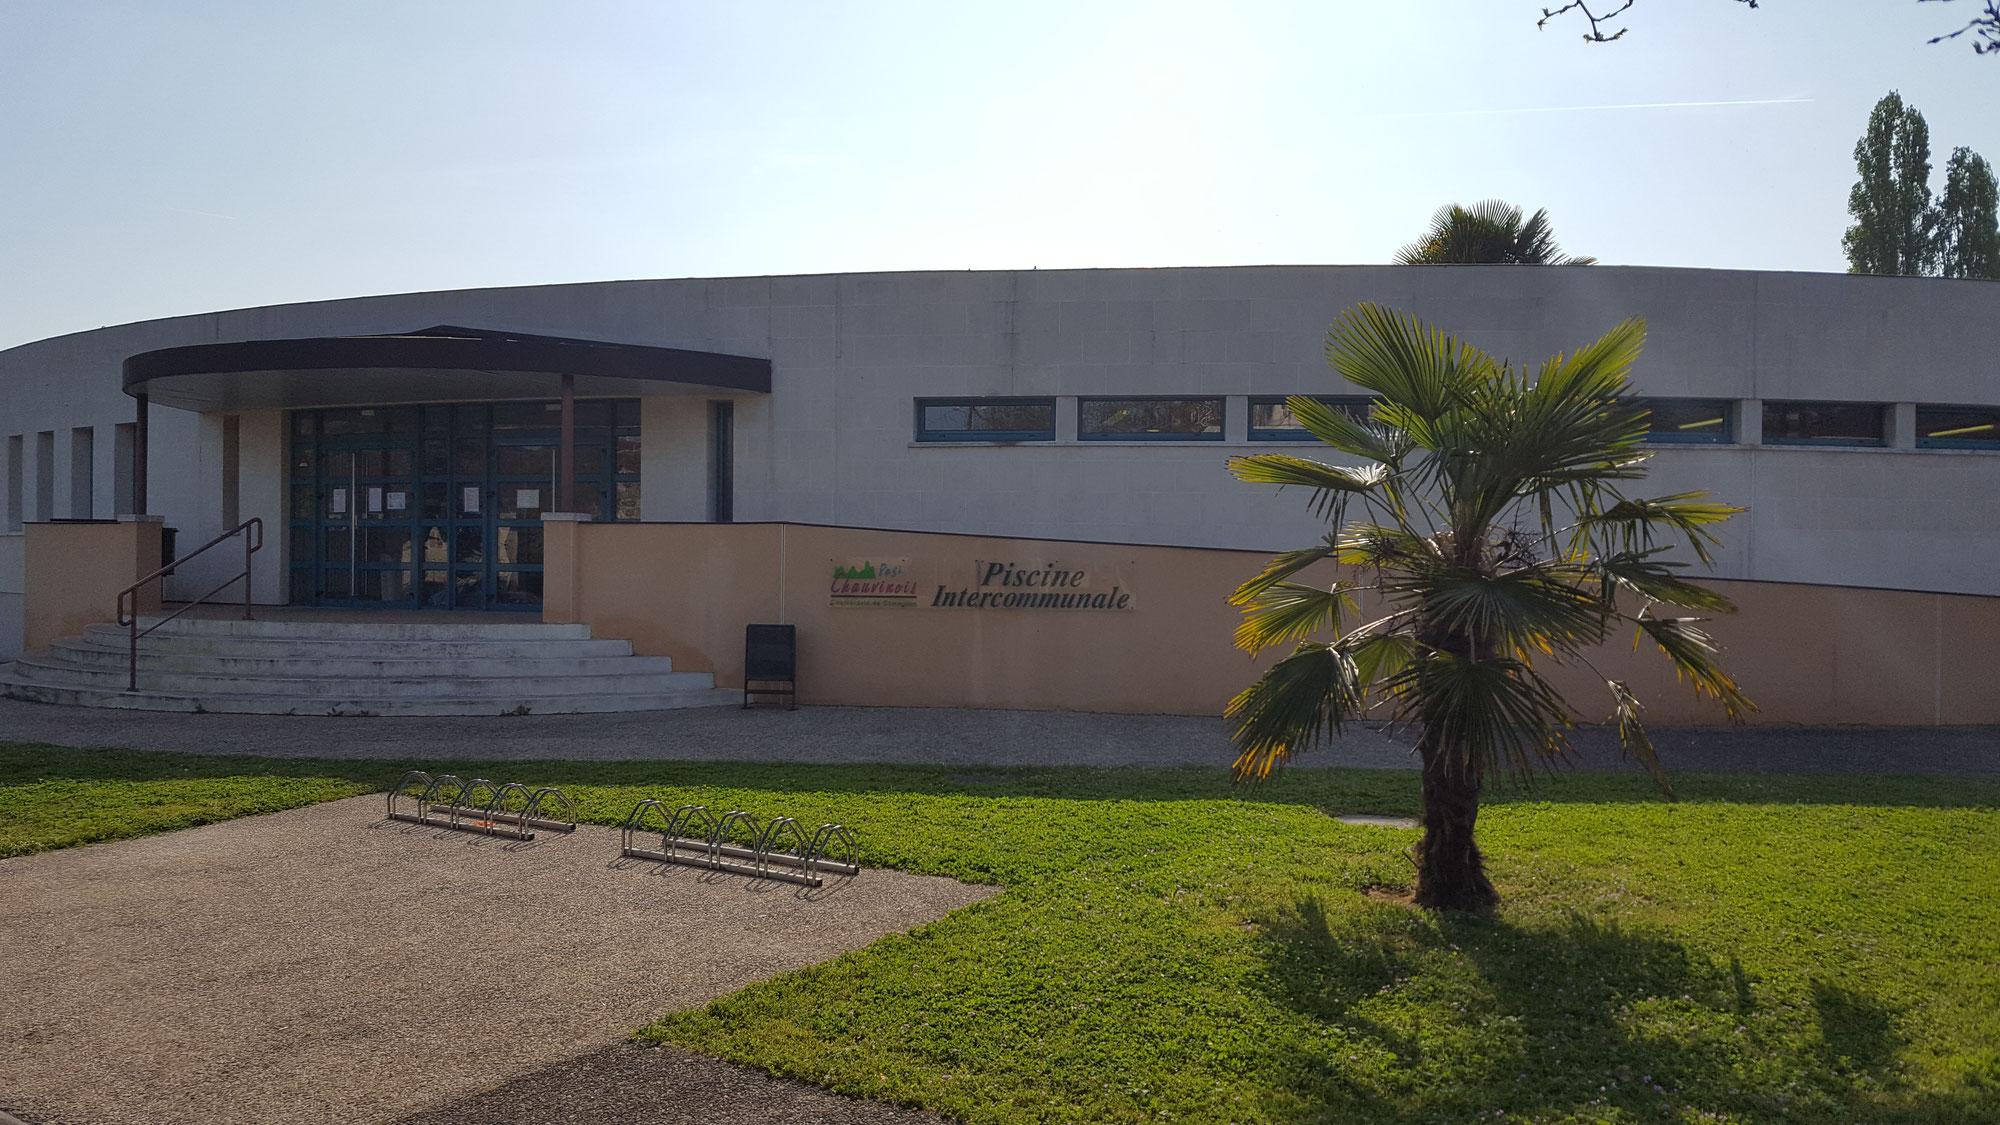 Site de piscine chauvigny 86 site de piscinechauvigny86 - Piscine poitiers horaires ...